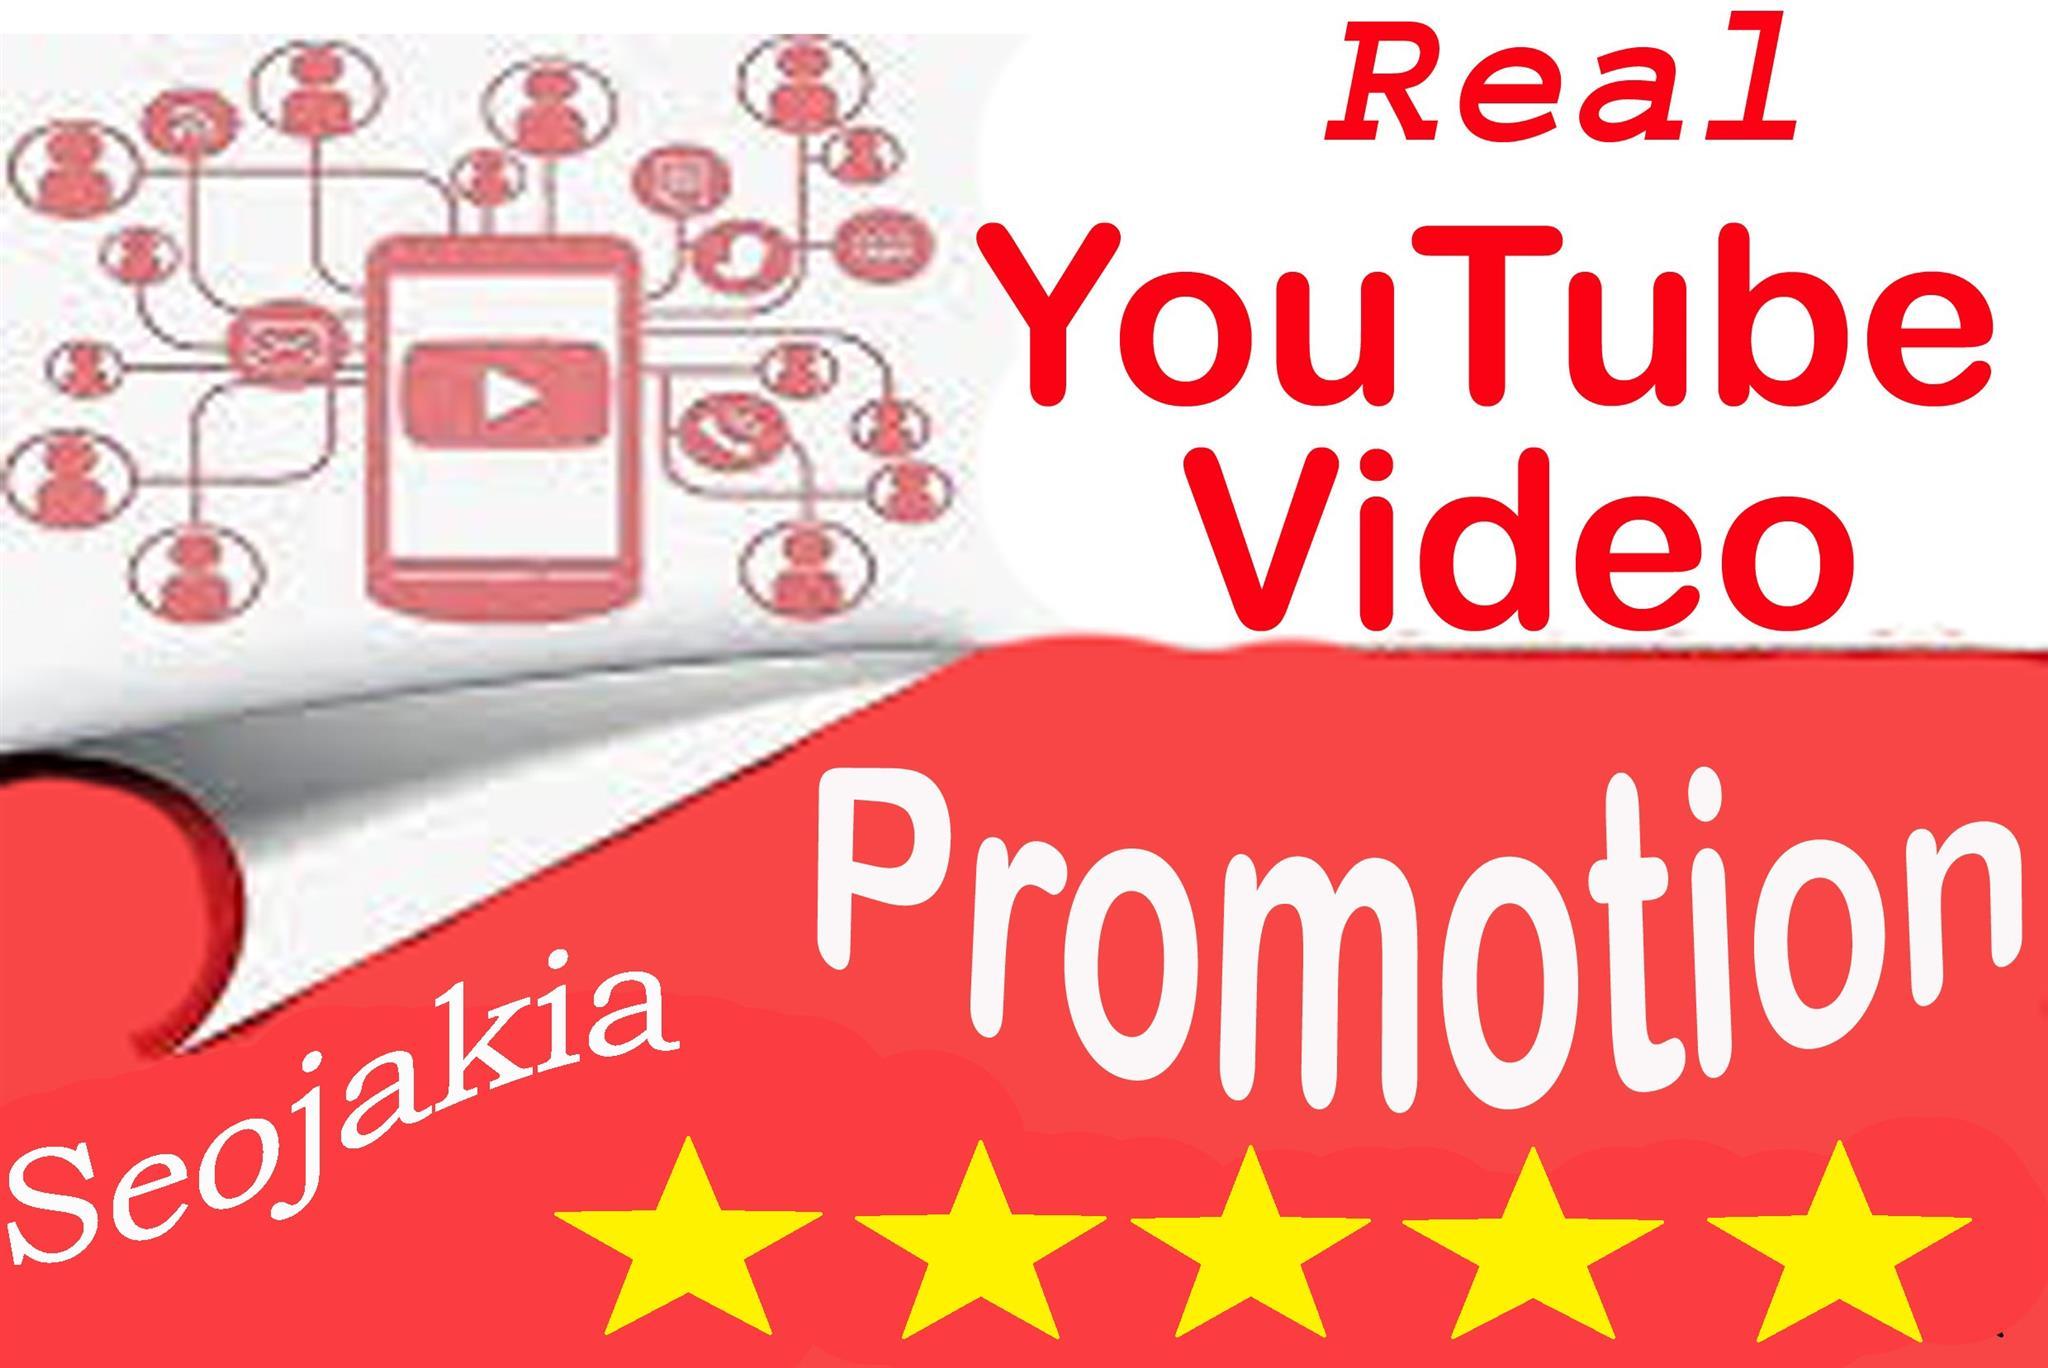 Organic Youtube  Marketing Seo Video Ranking Promotion